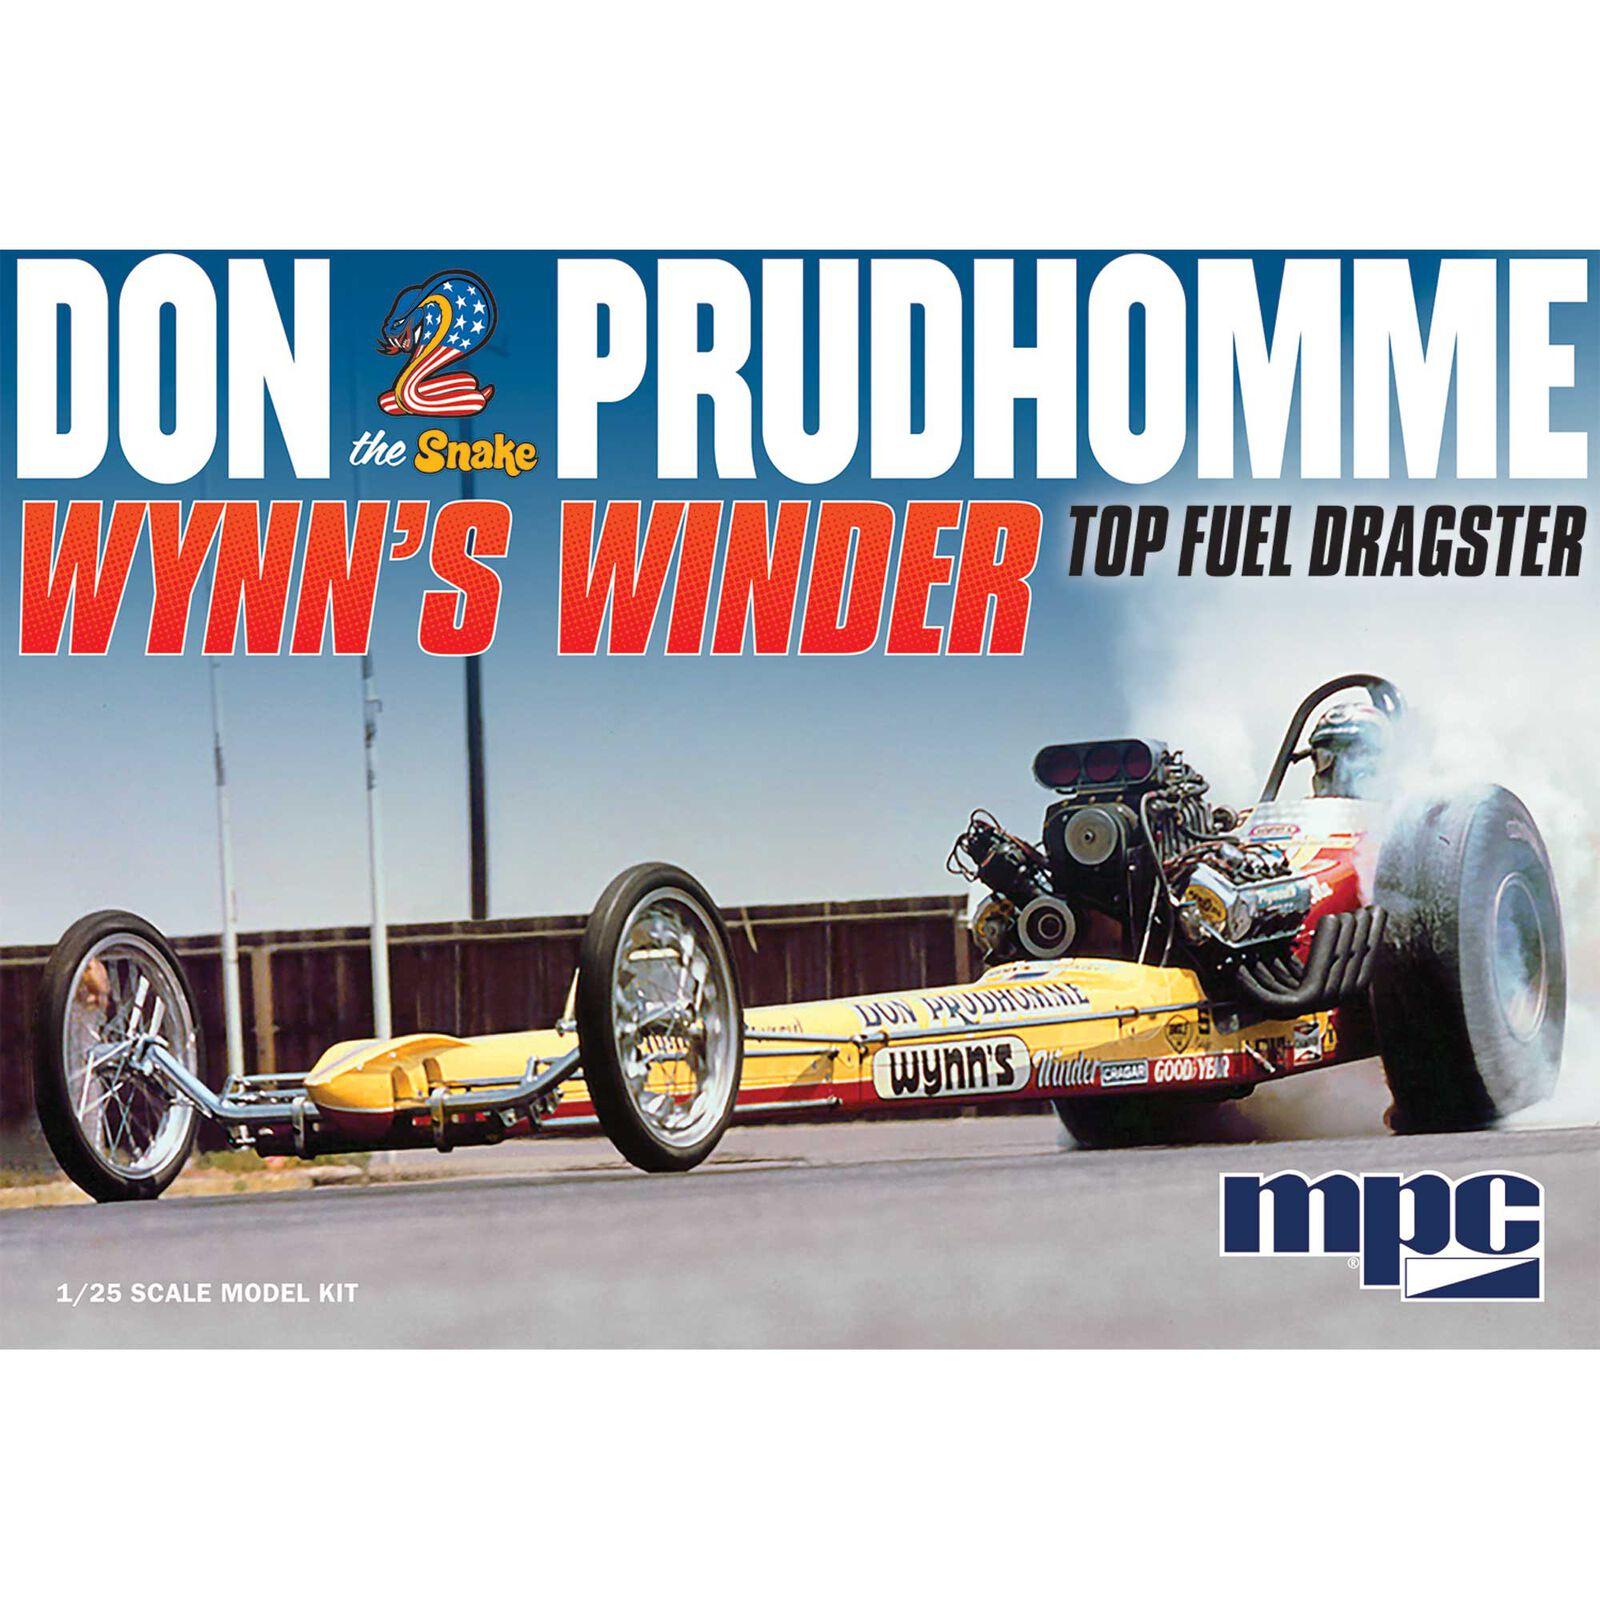 1/25 Wynns Winder Dragster Don Snake Prudhomme